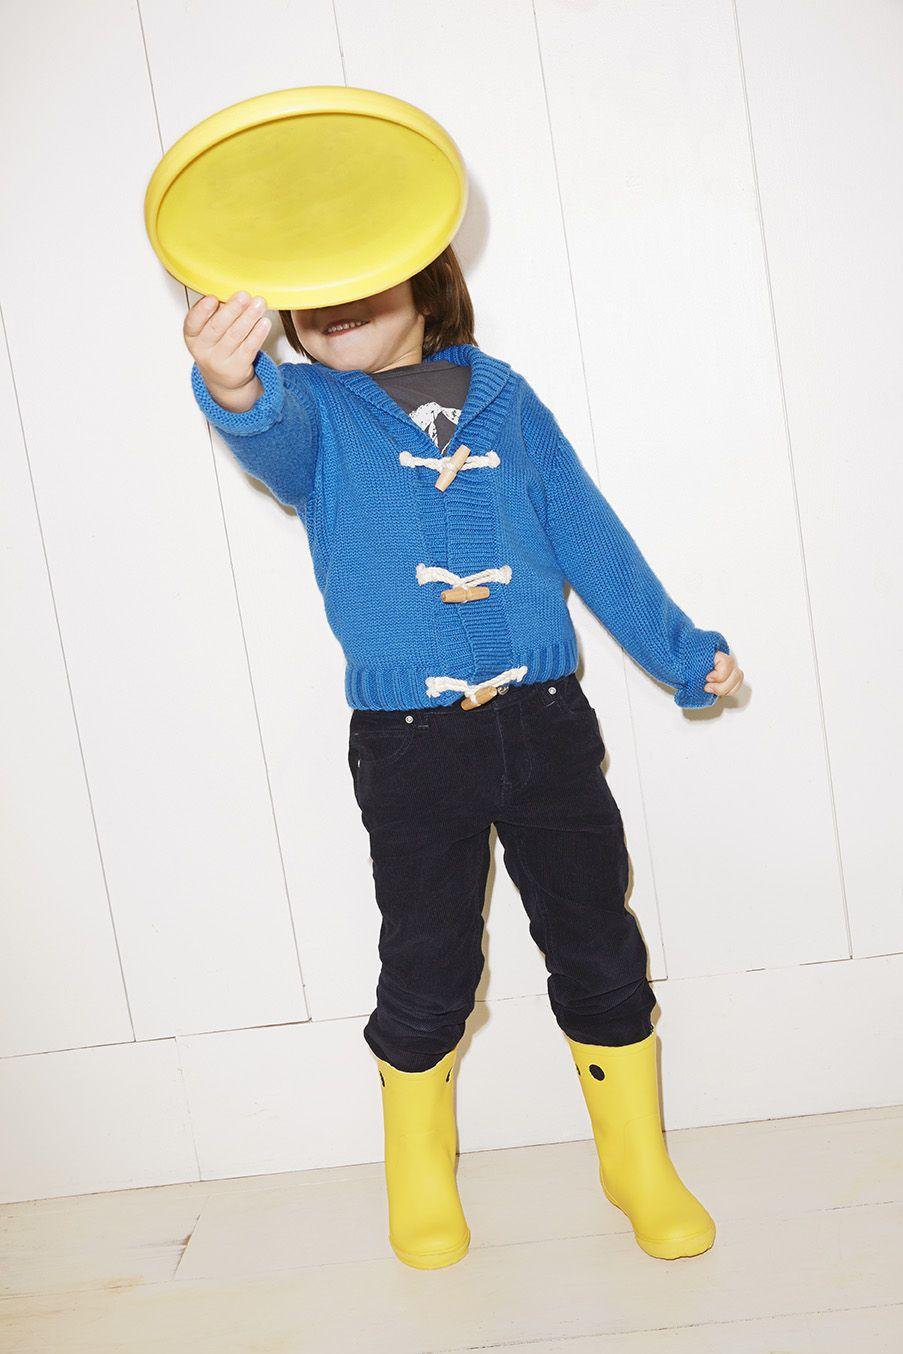 Autumn/Winter 2014-2015 lookbook - http://www.petit-bateau.fr/?CMP=SOC_11732SOU=TYP=SOCKW=pinterest #petitbateau #kids #kidsfashion